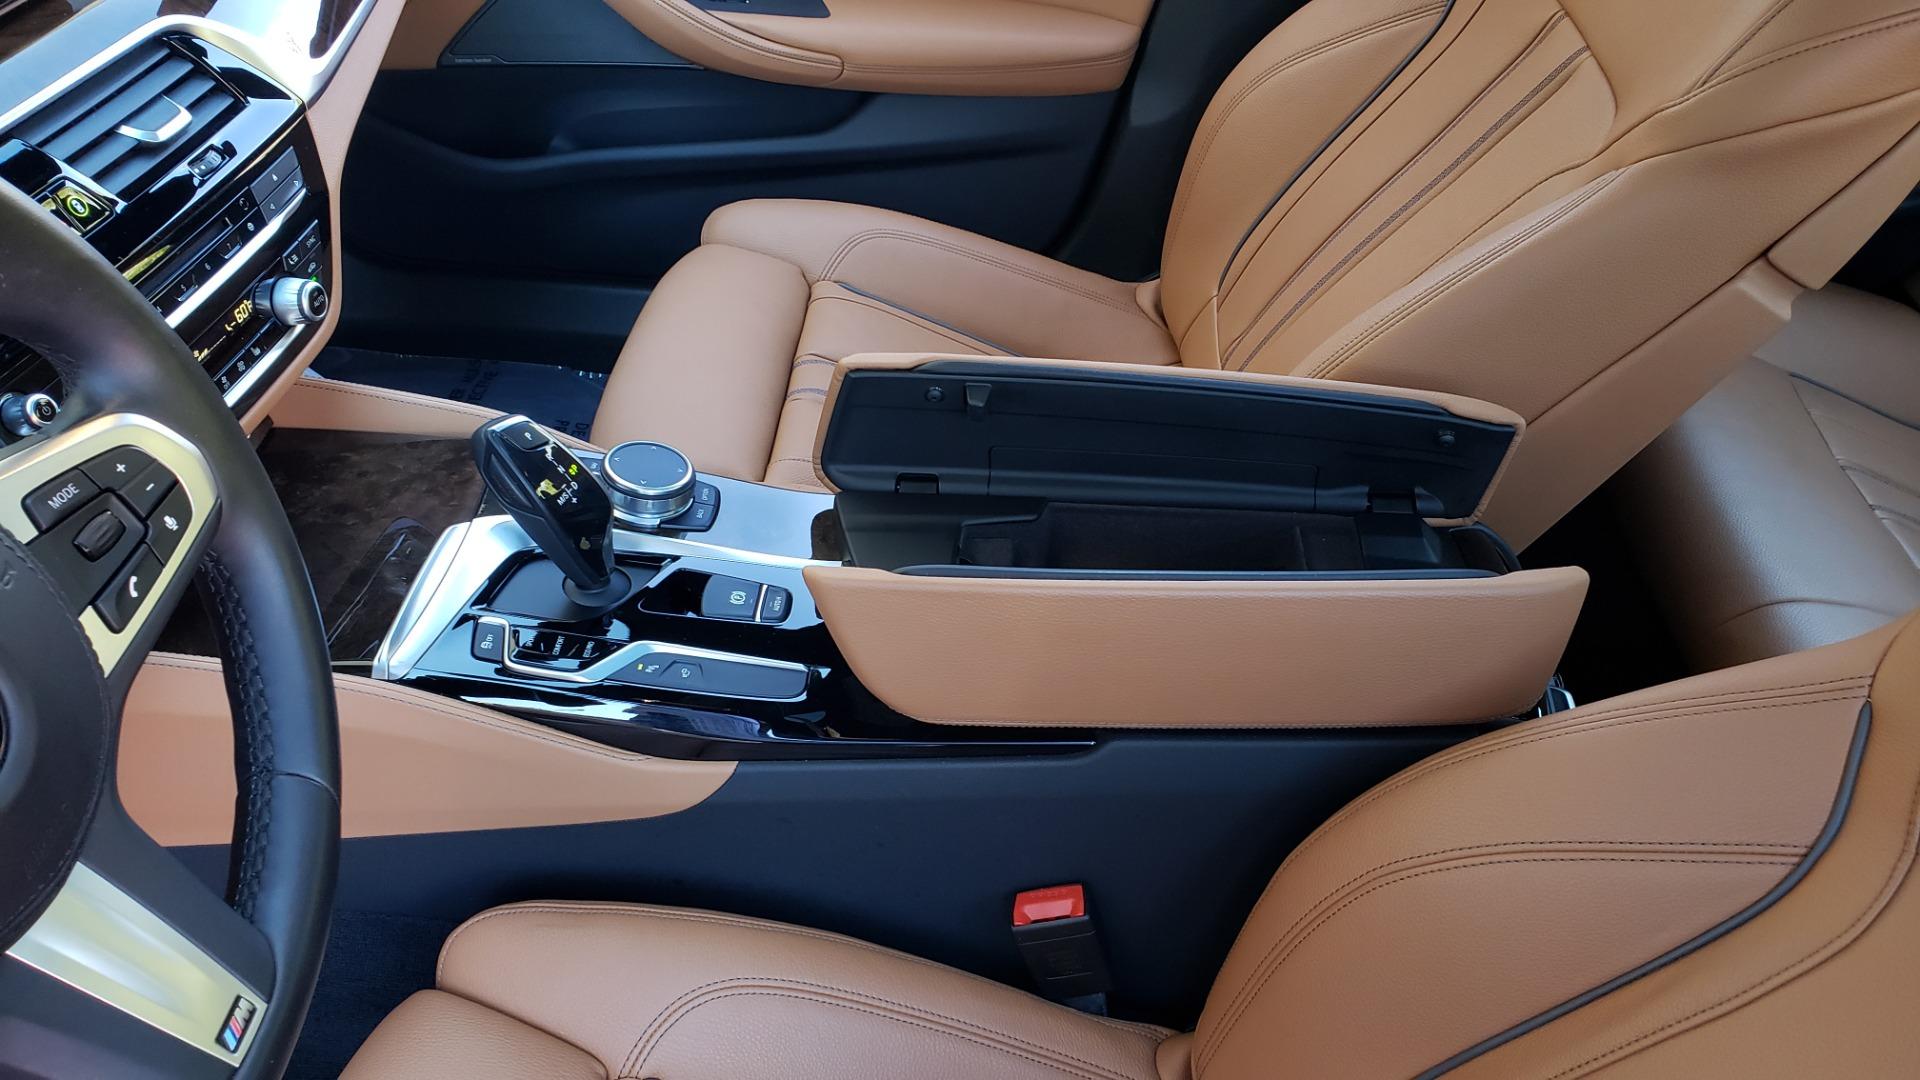 Used 2018 BMW 5 SERIES 540I M-SPORT / DRVR ASST / EXEC PKG / NAV / SUNROOF / HUD / REARVIEW for sale Sold at Formula Imports in Charlotte NC 28227 58